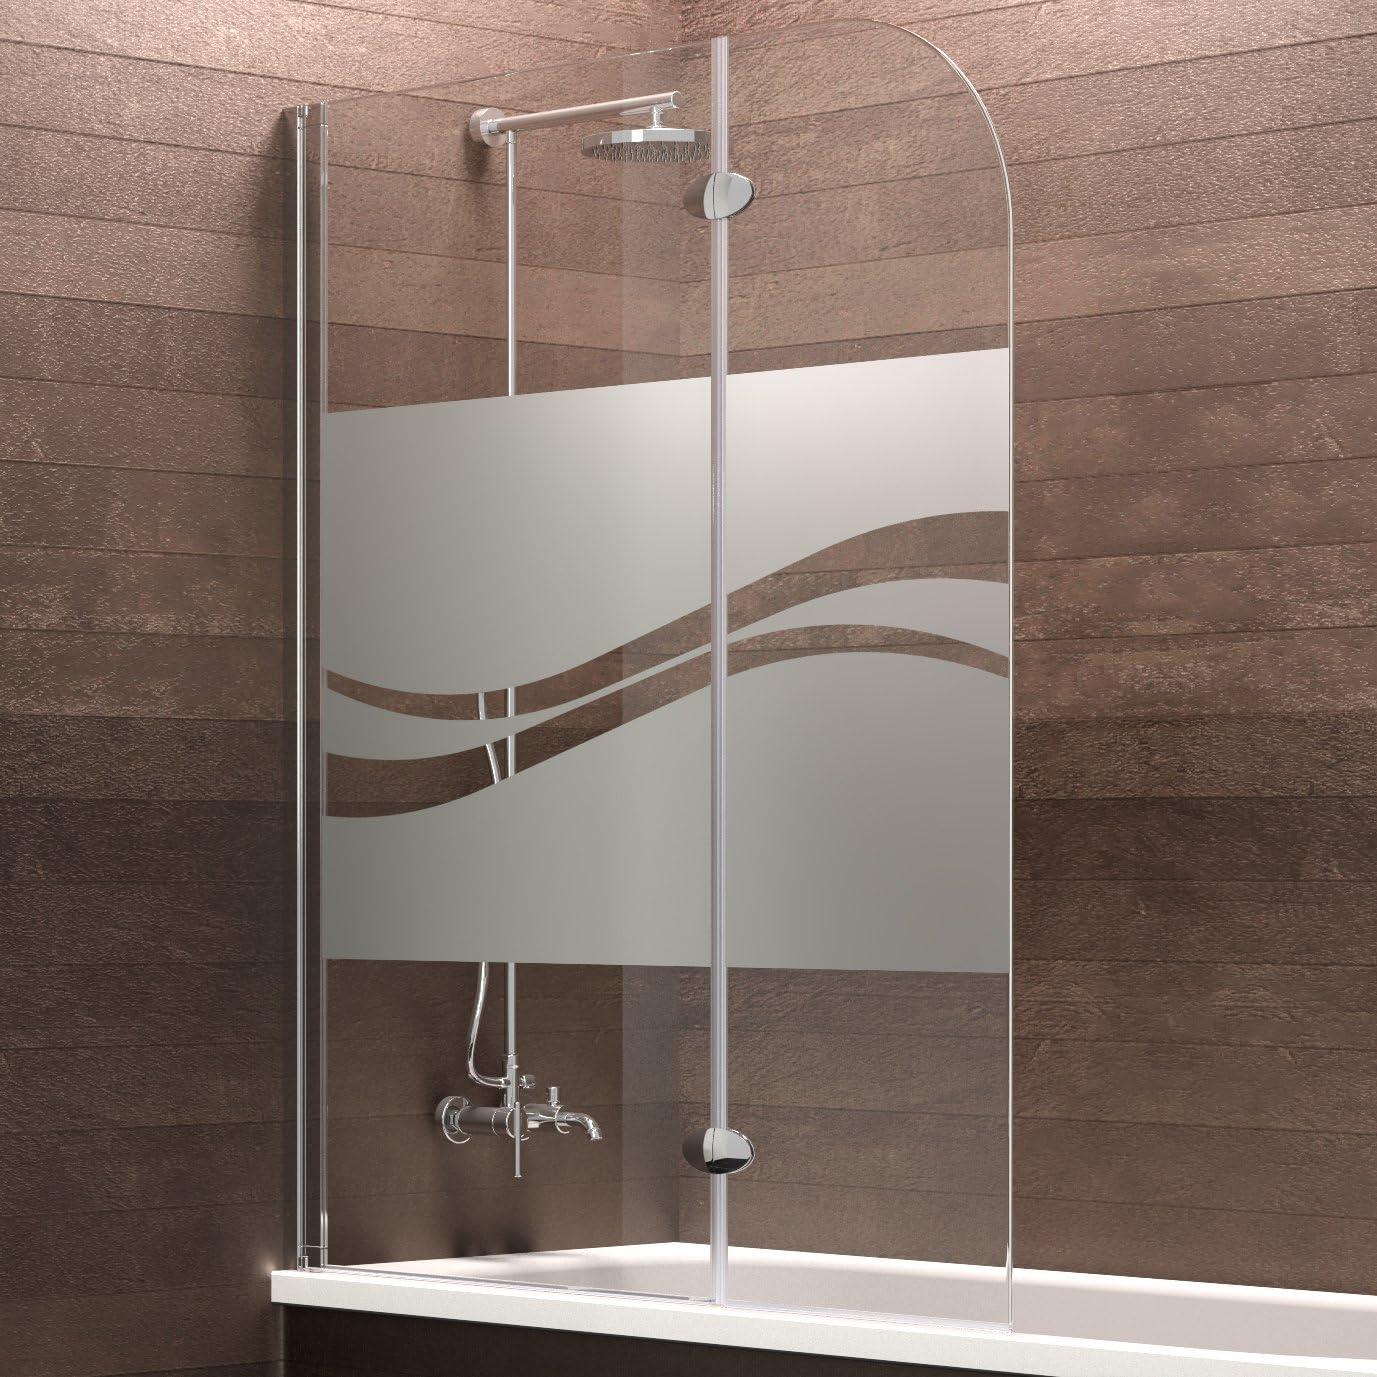 Schulte Mampara de bañera Cristal (2 piezas, 140 x 112 cm Hamburgo ...